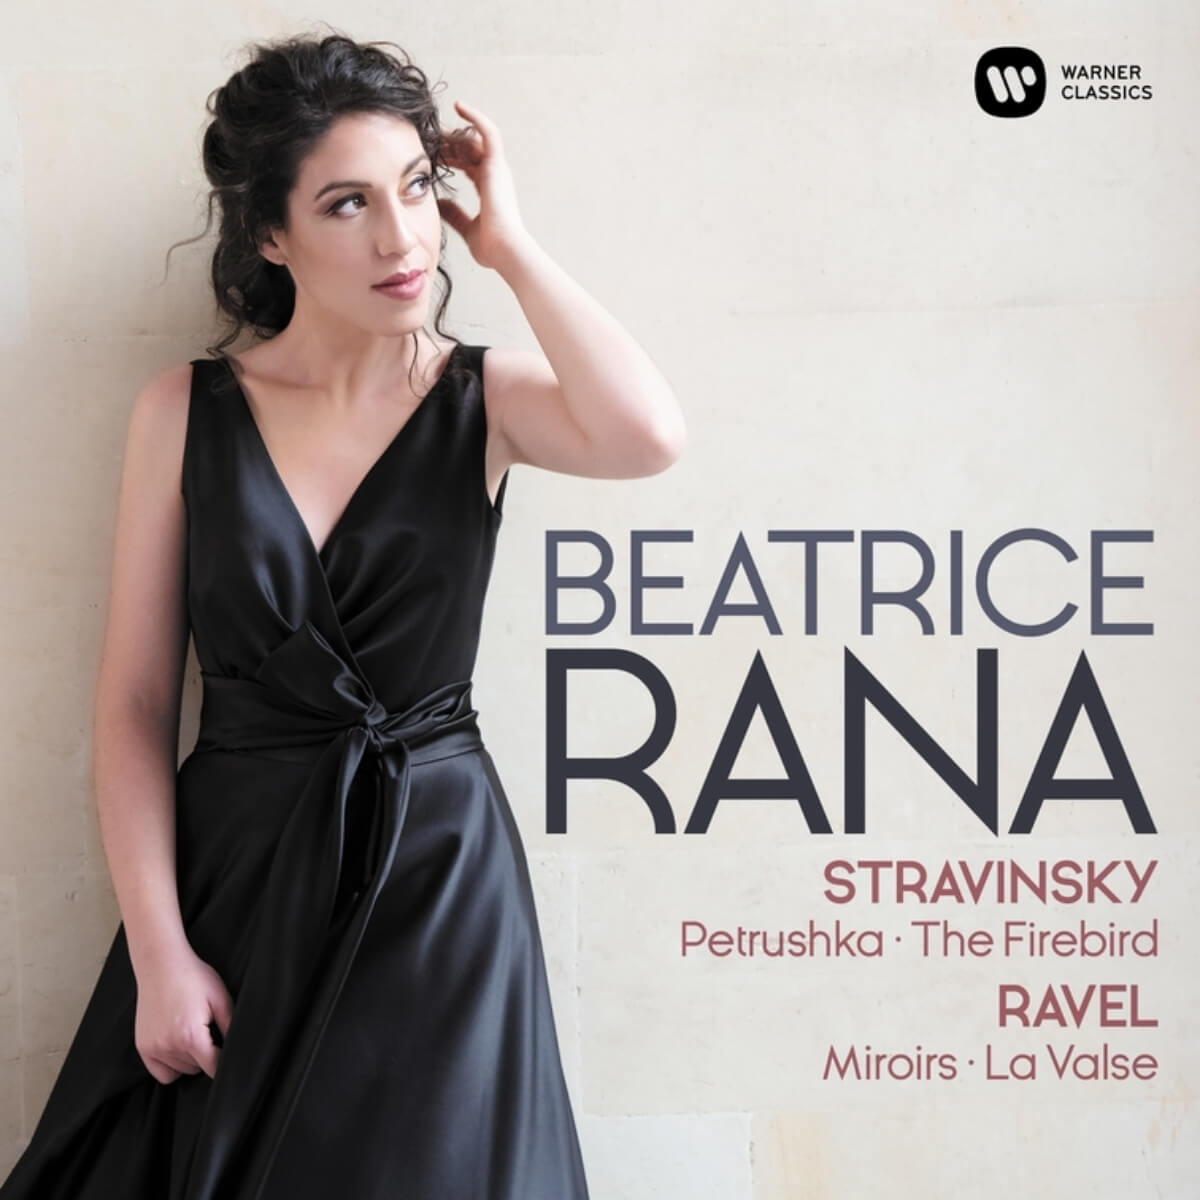 pochette de disque Beatrice Rana, pianiste, Stravinsky, Ravel